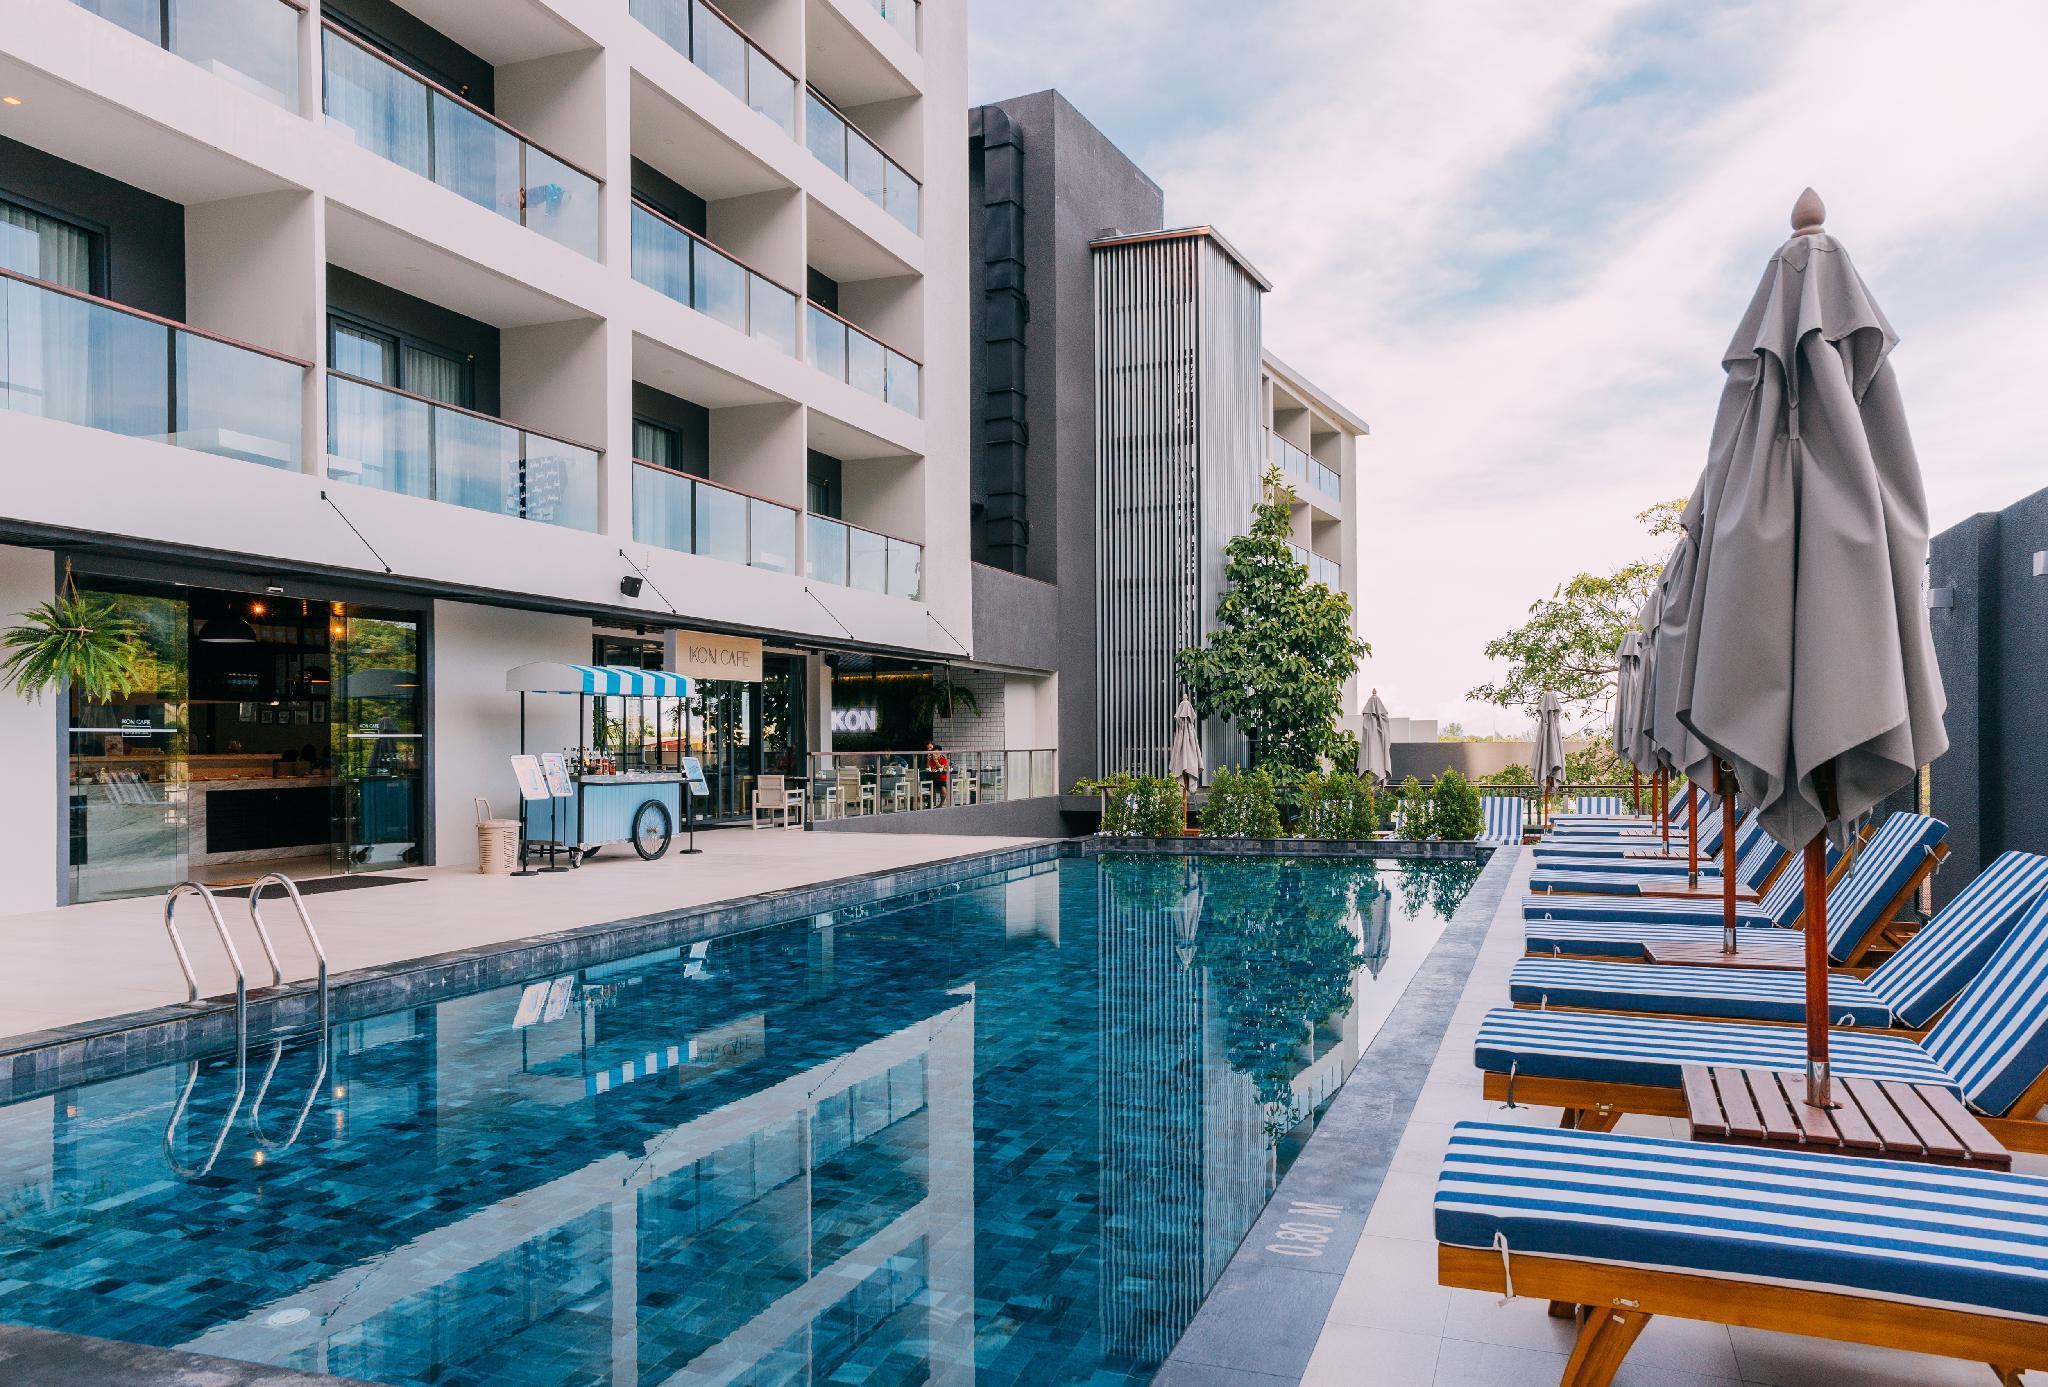 Hotel IKON Phuket โฮเต็ล ไอคอน ภูเก็ต